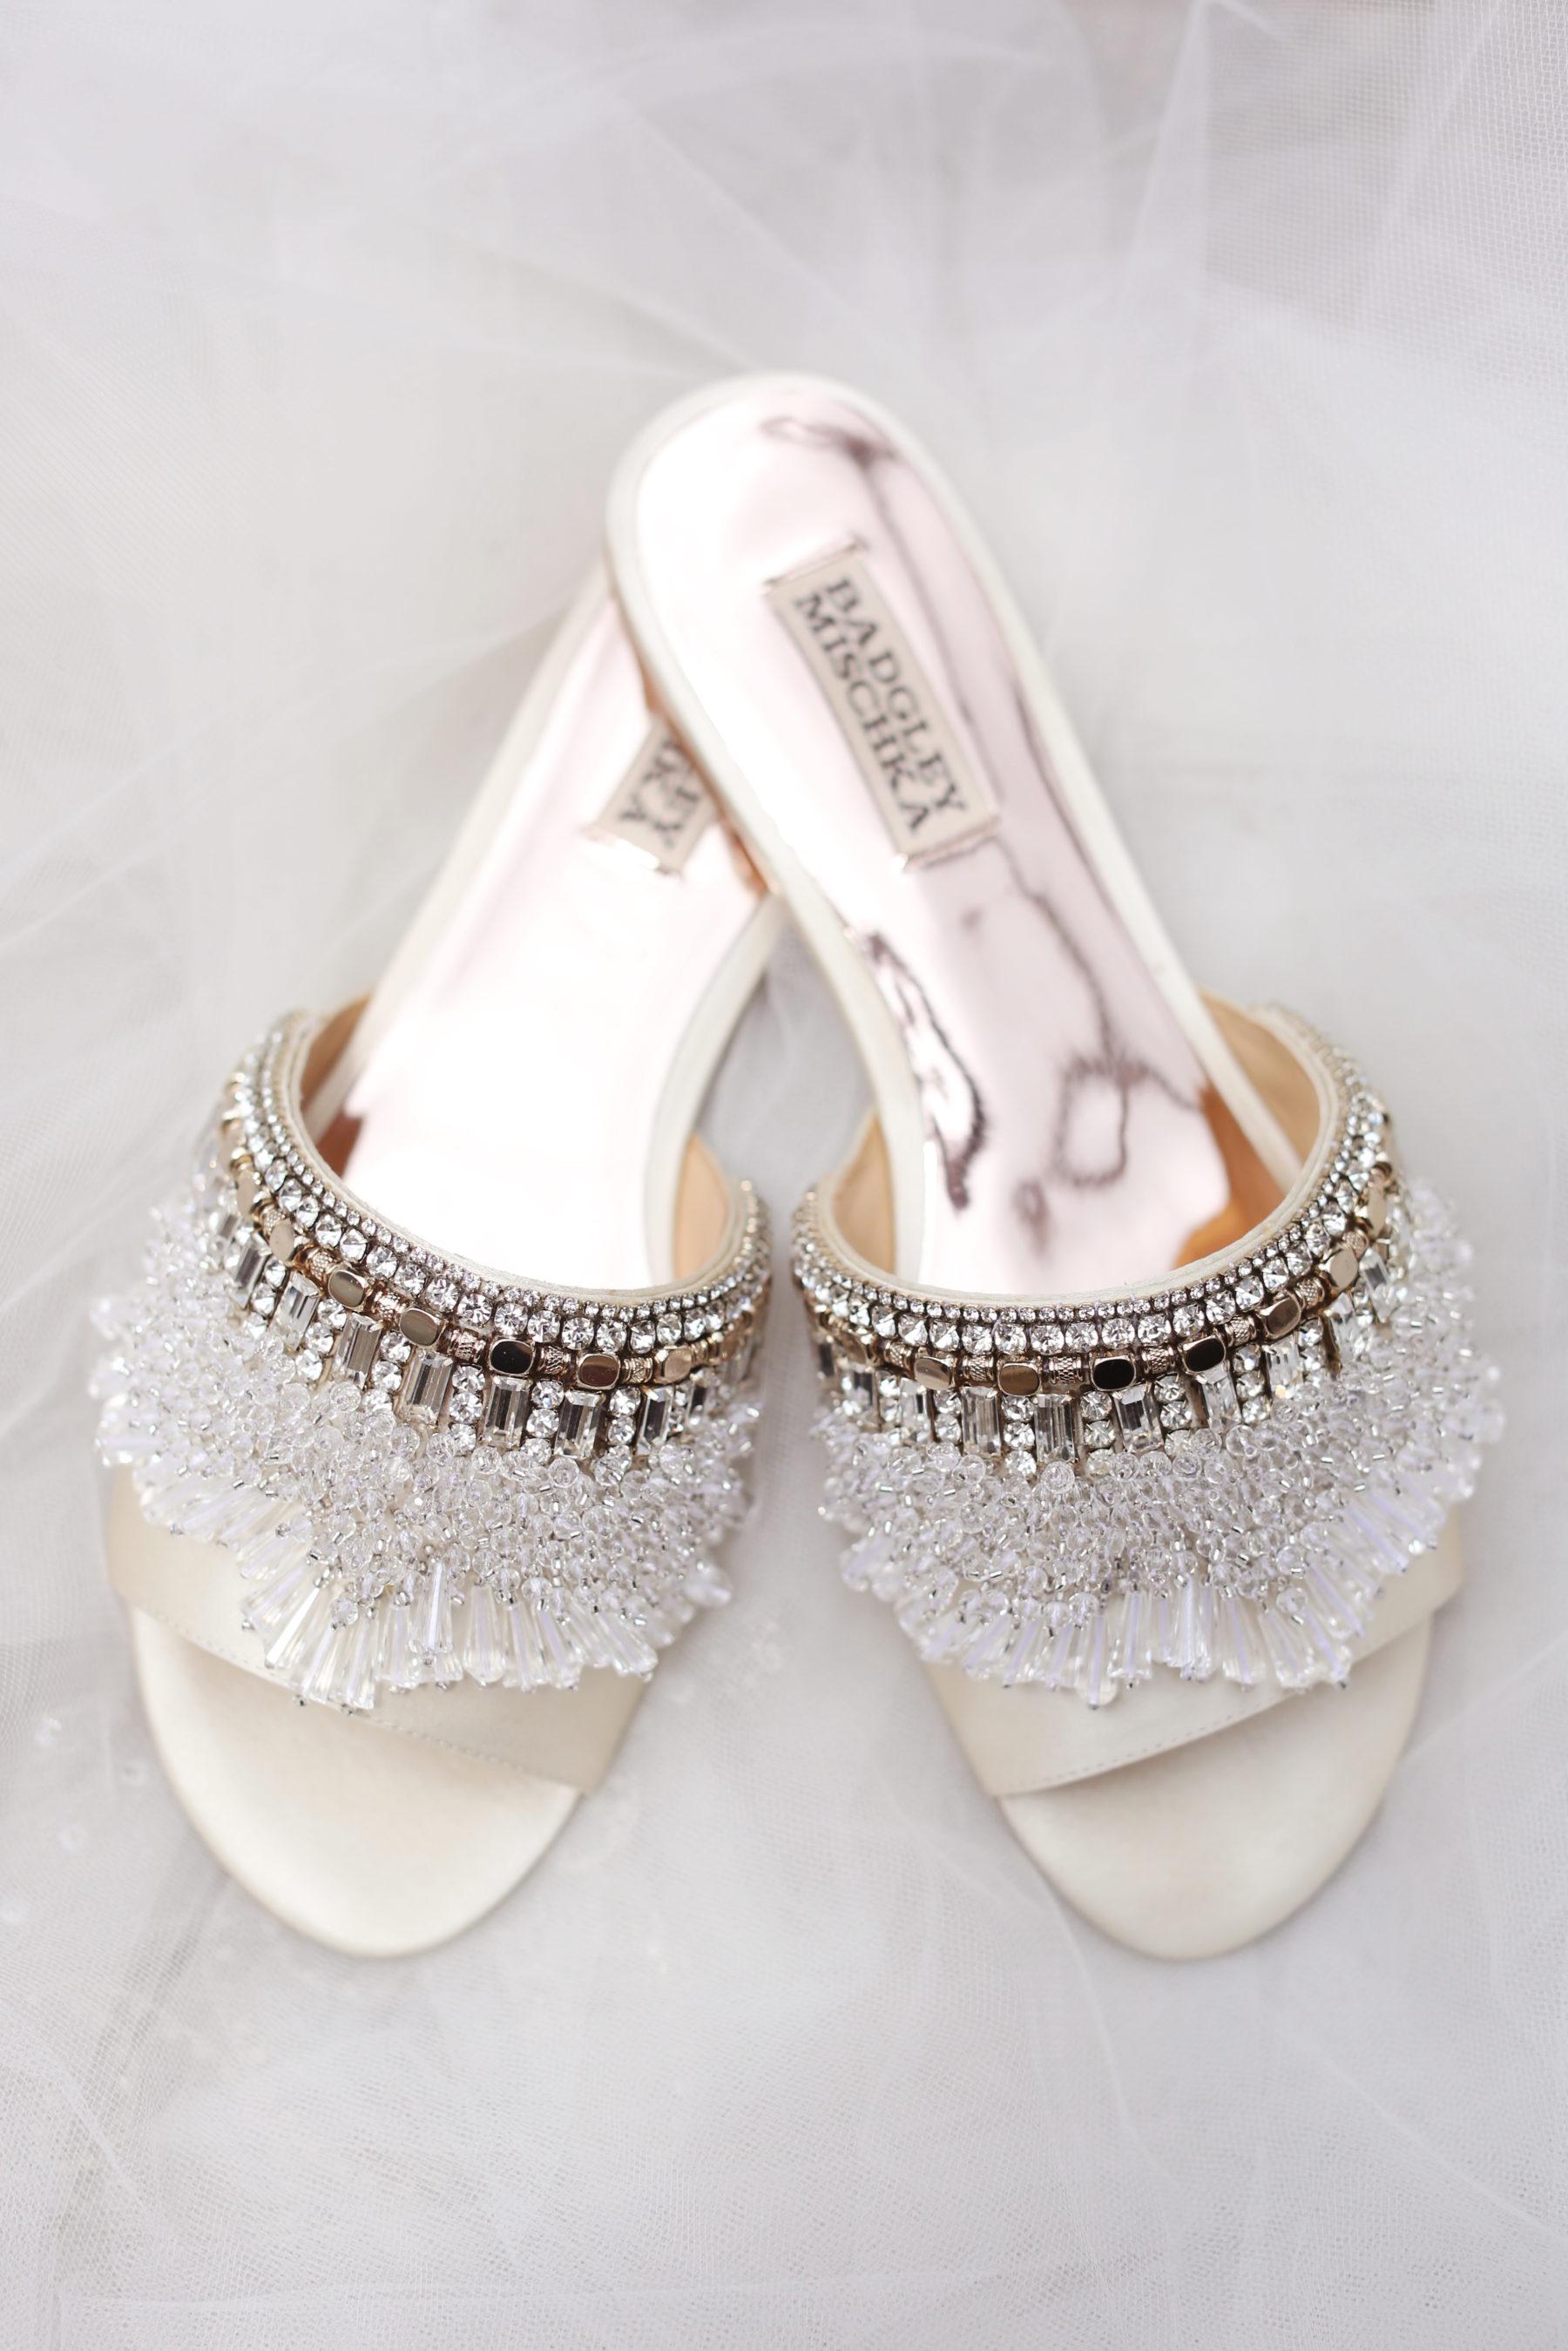 Badgley Mischka Bridal Shoes featured on Nashville Bride Guide